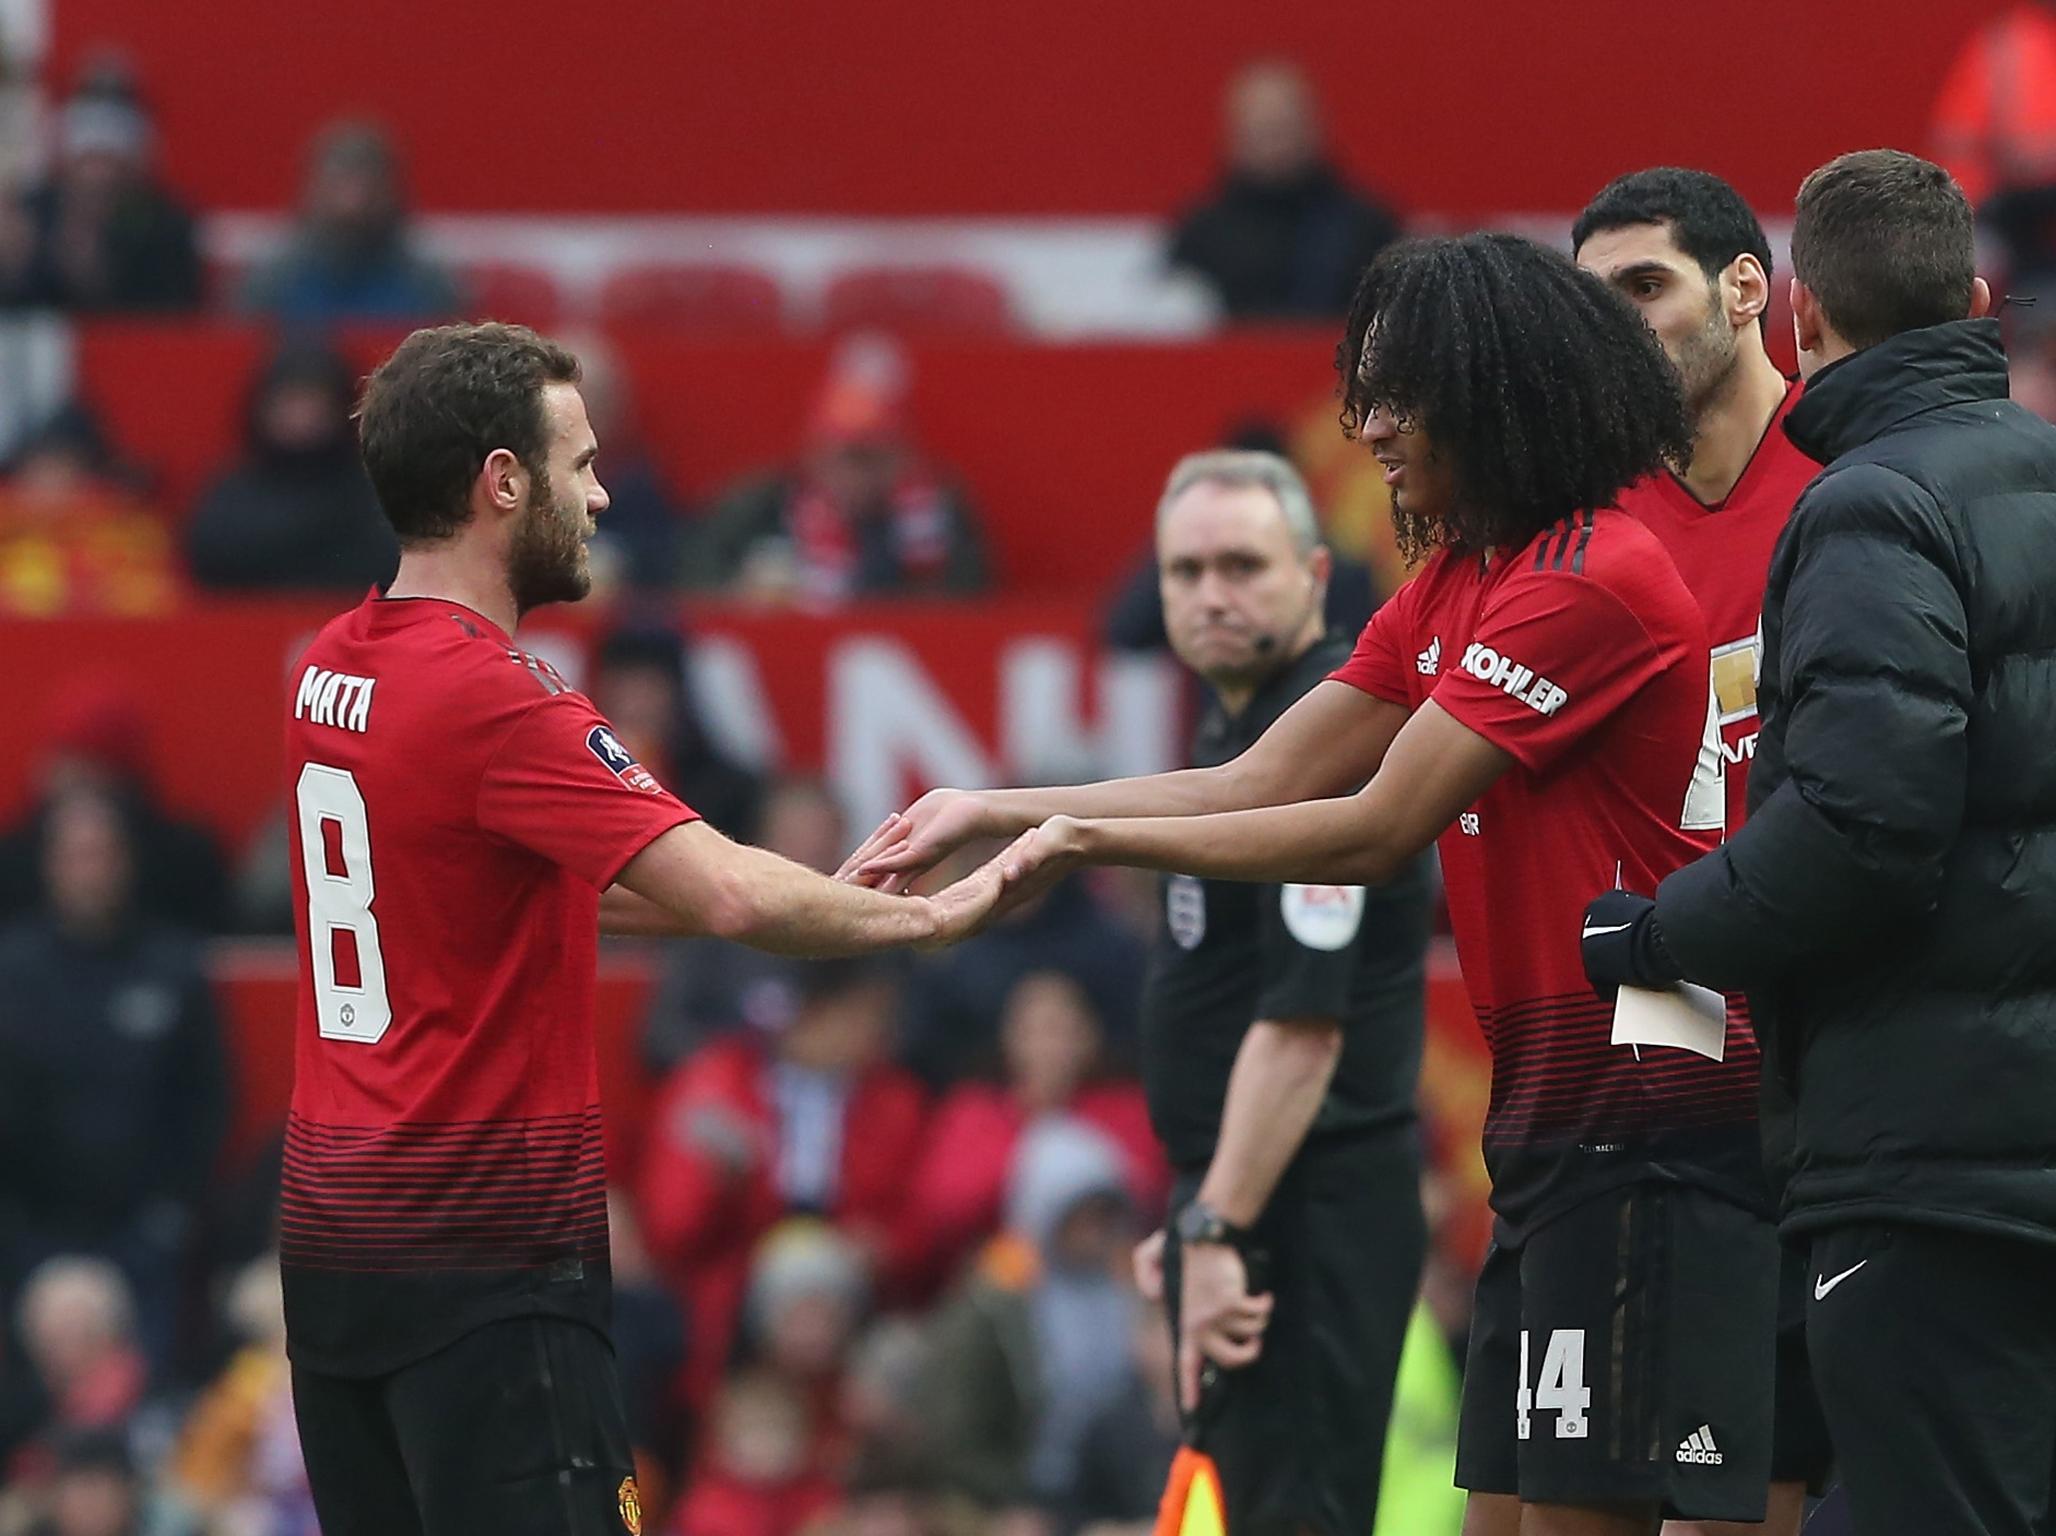 Ole Gunnar Solskjaer proved Jose Mourinho was right with Manchester United team decision - Bóng Đá